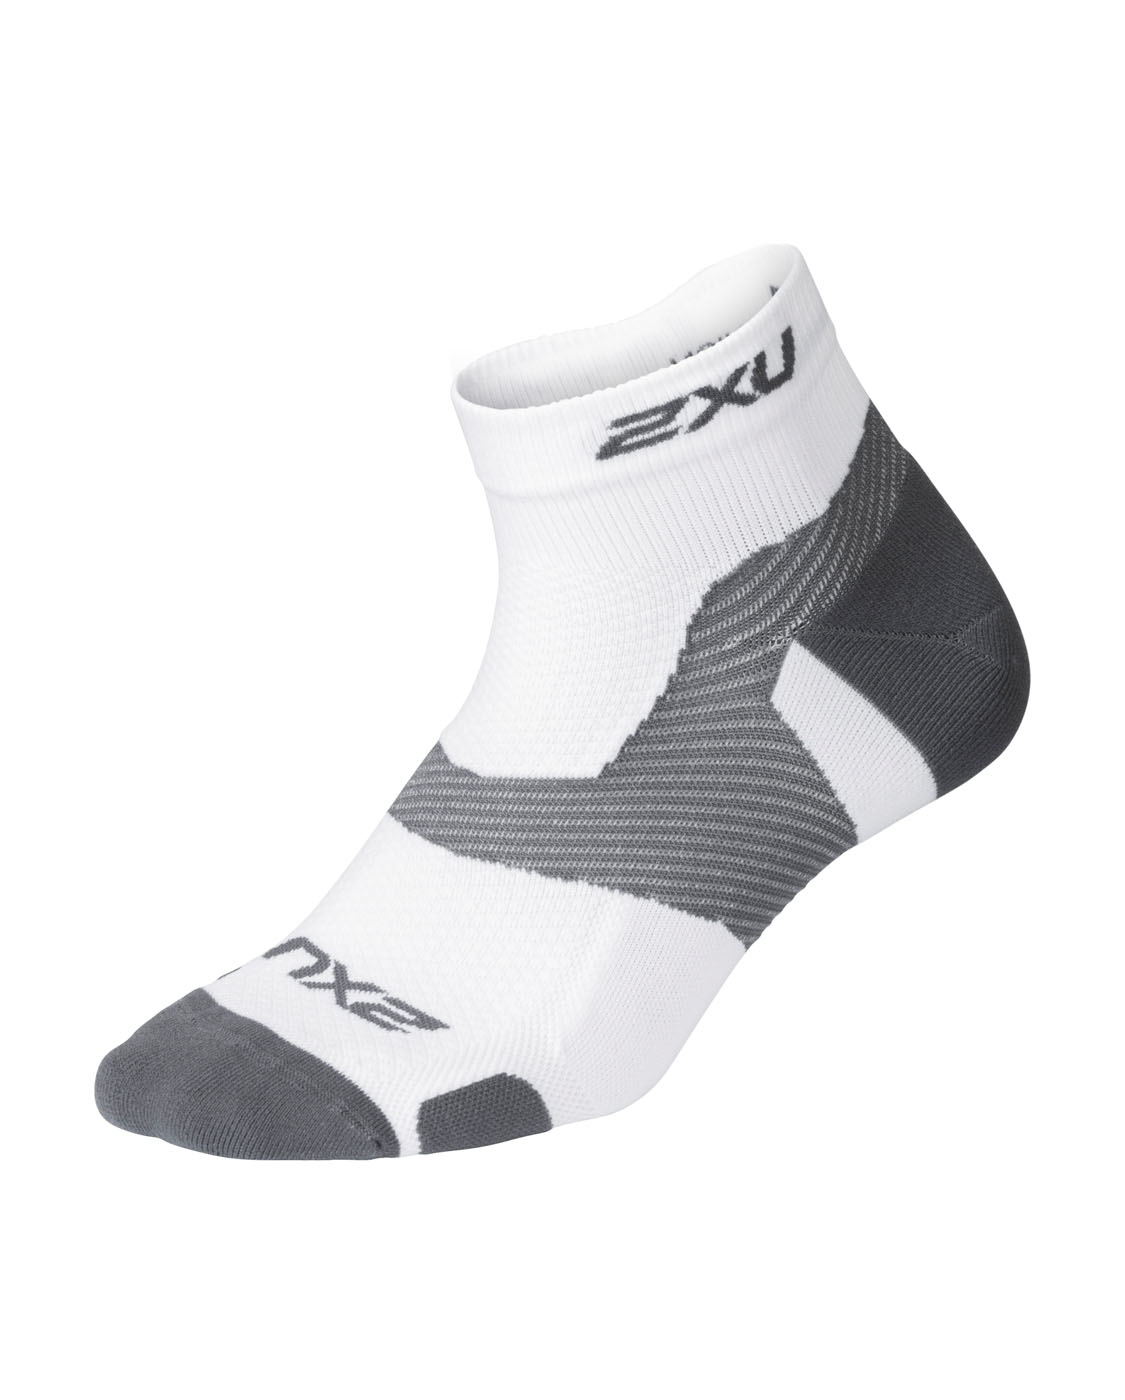 2XU Unisex Vectr Light Cush 1/4 Crew Sock - White/Grey